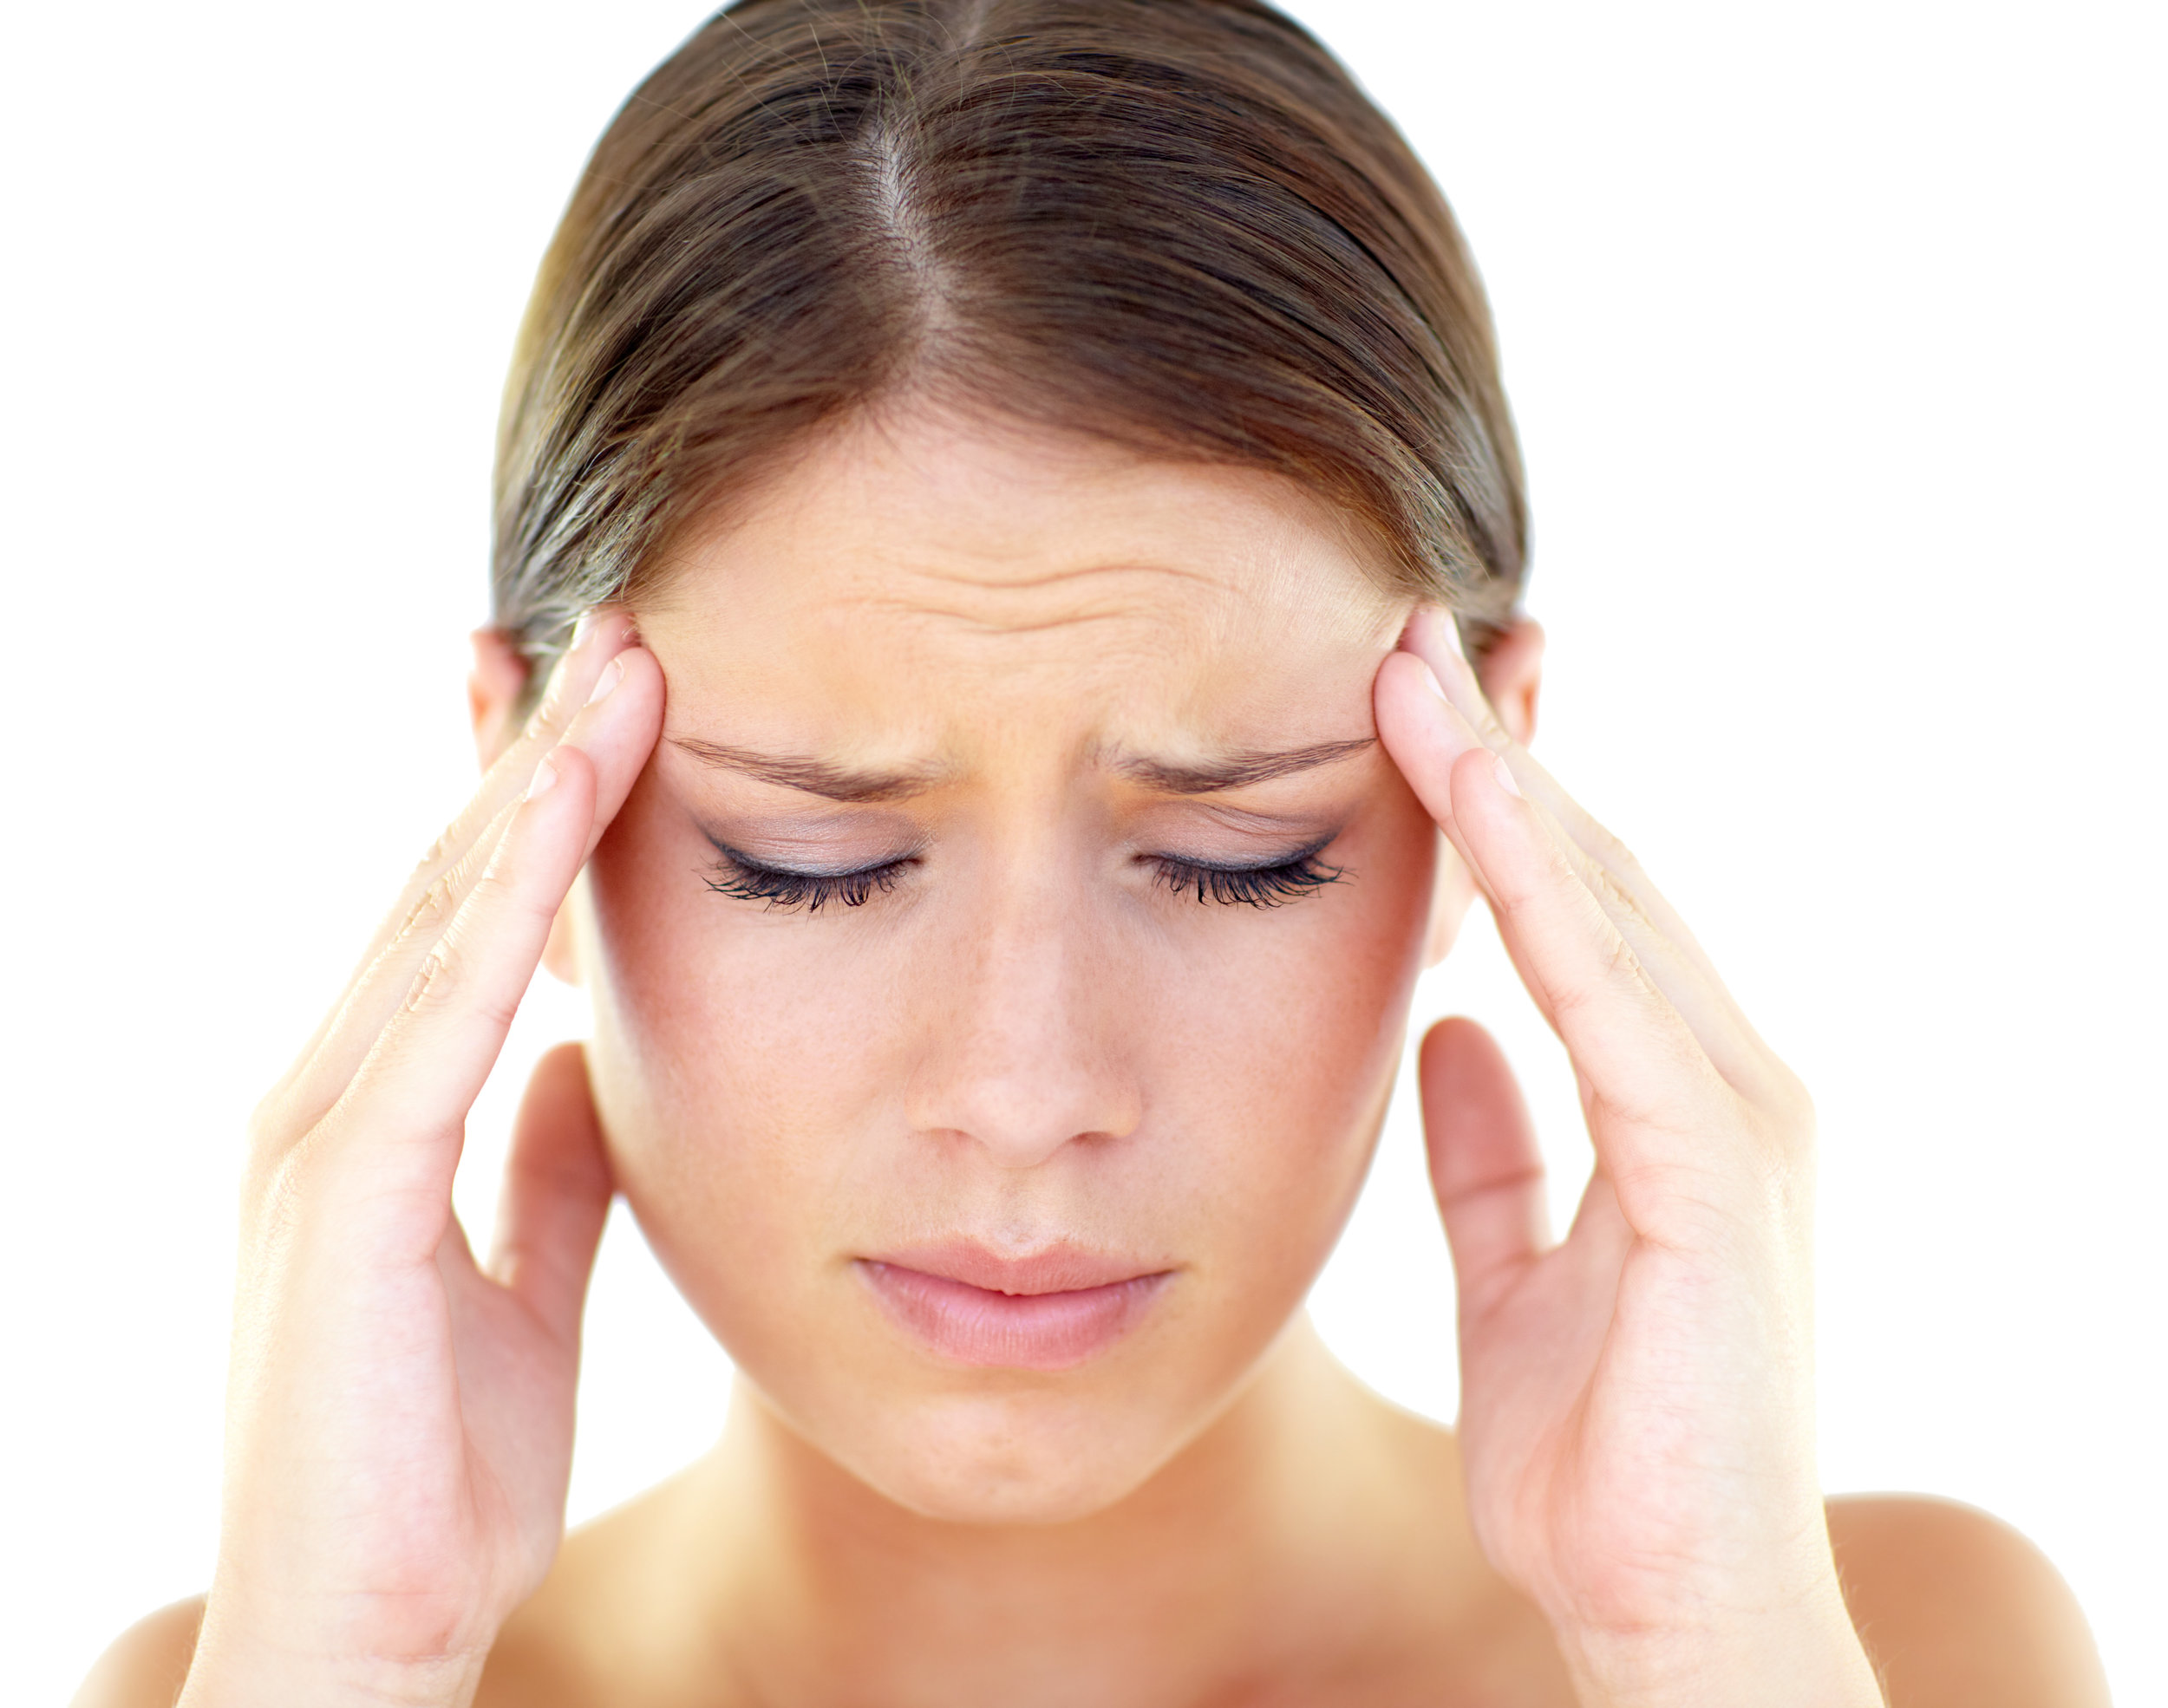 My Own Migraine Headache Experience